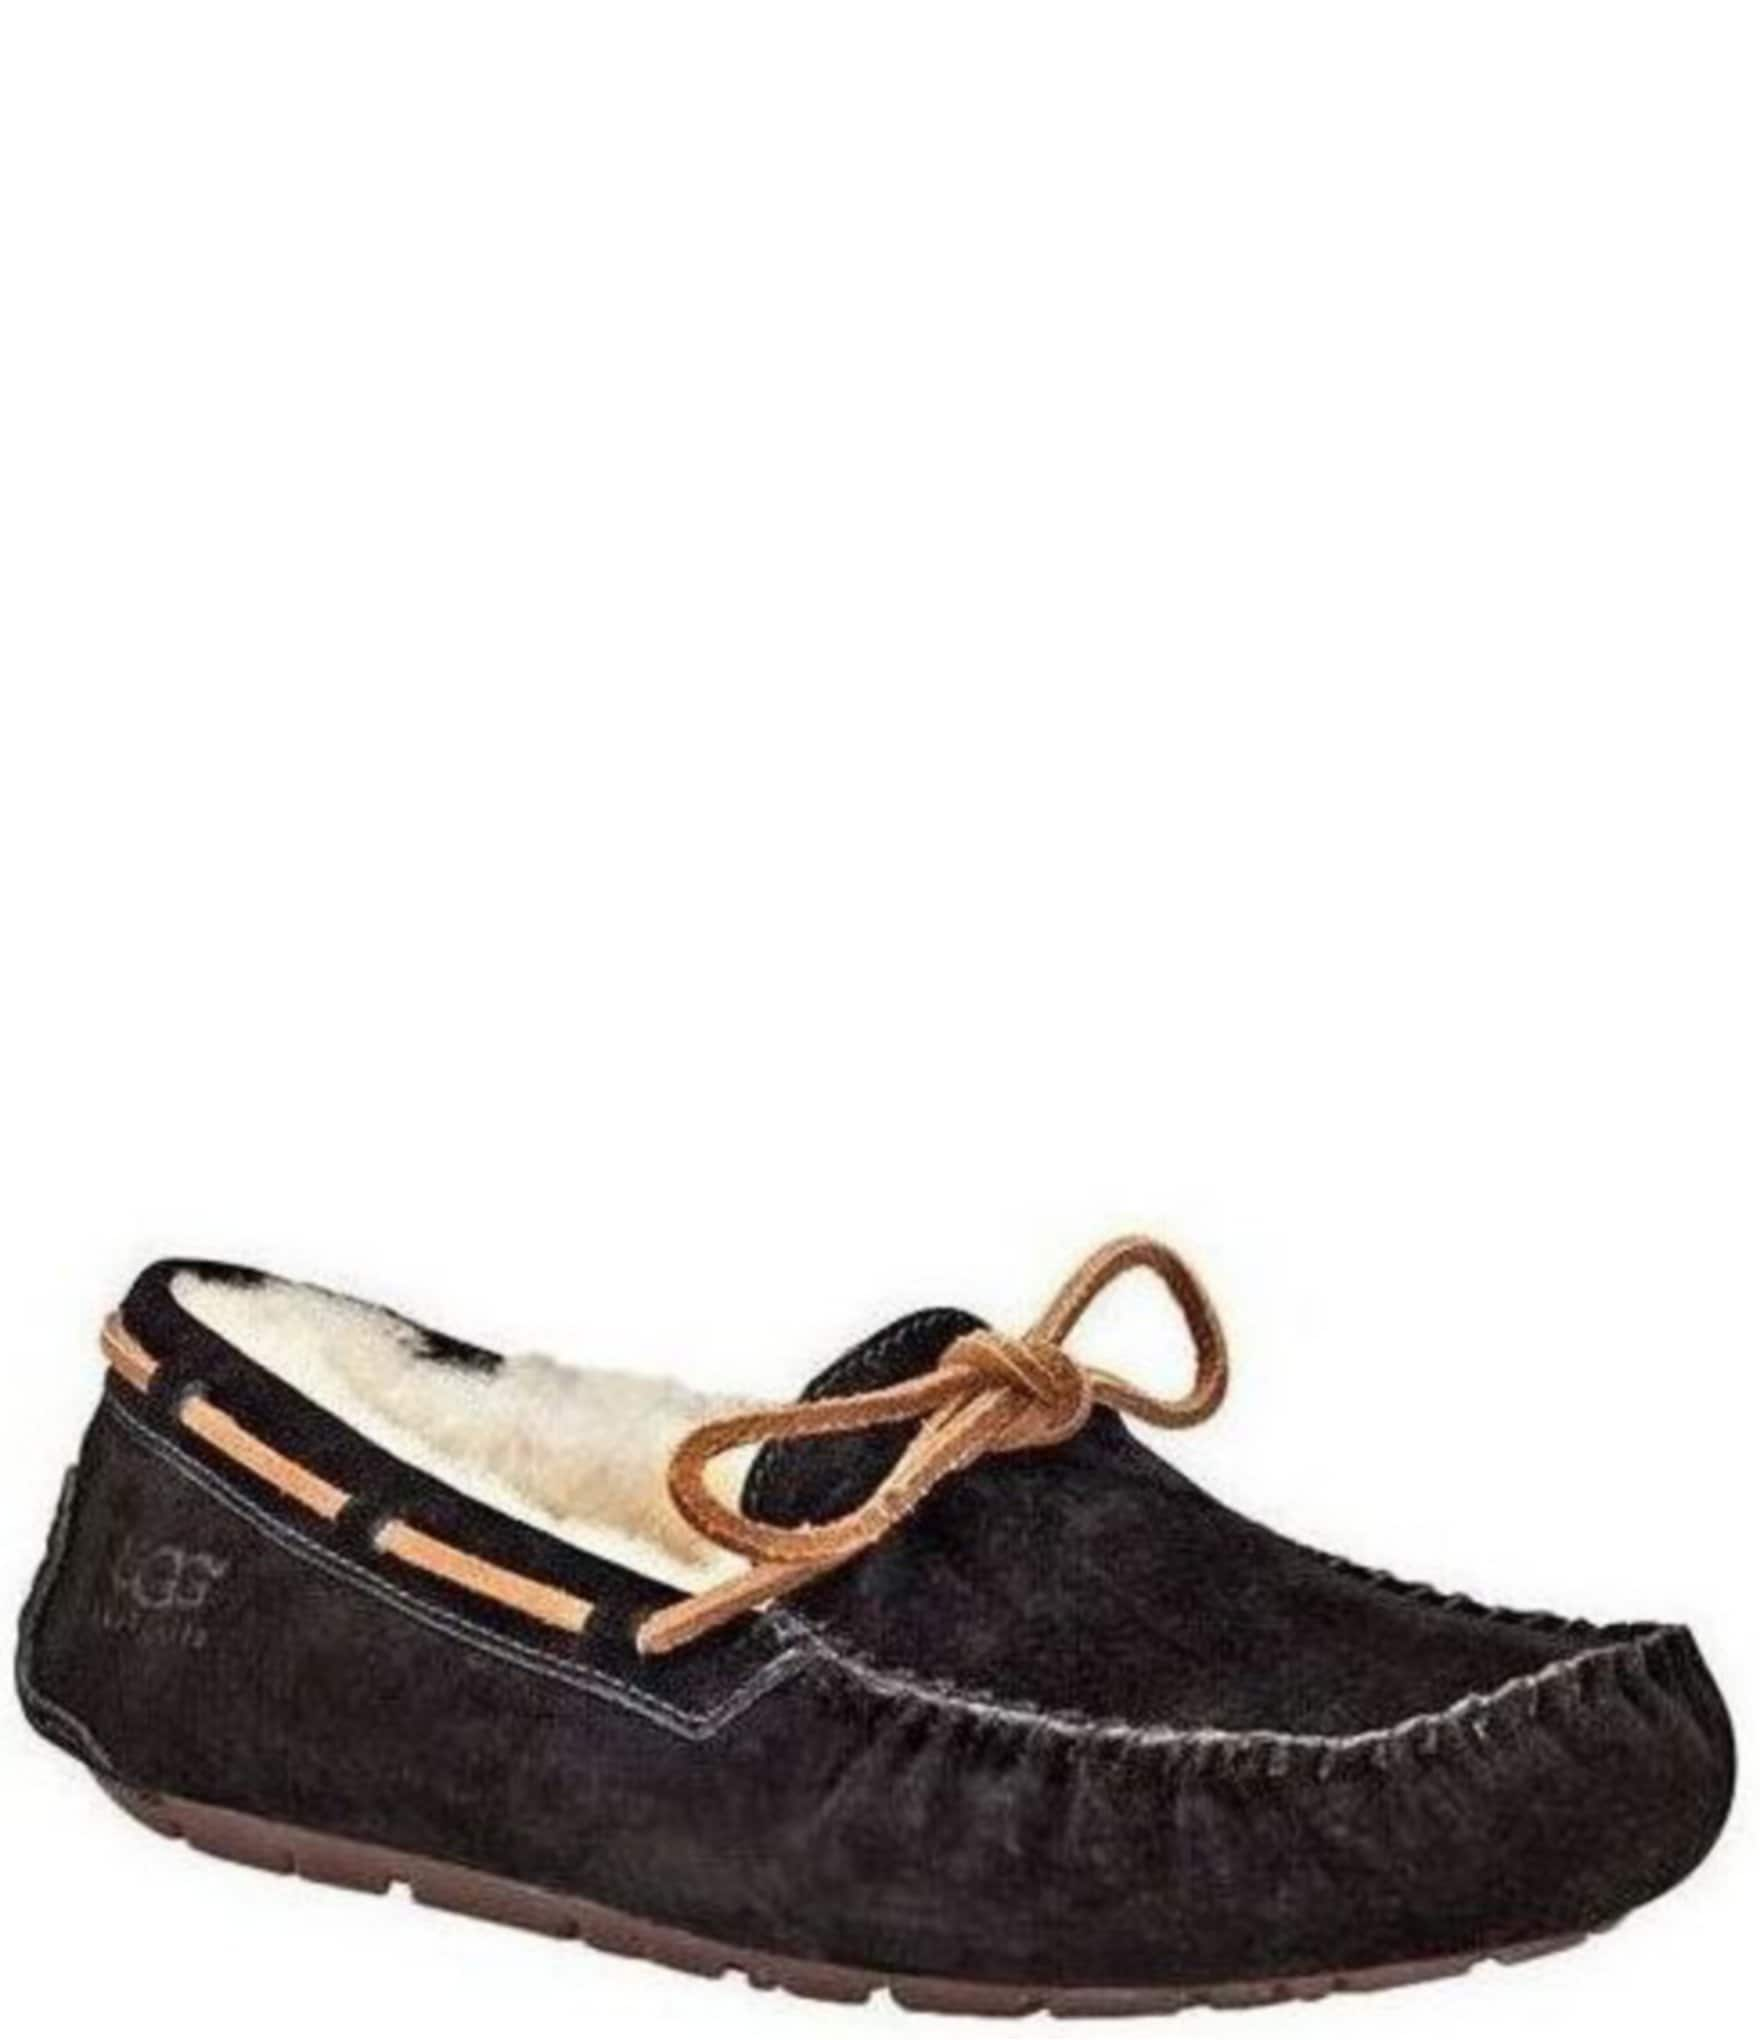 7944526d439 UGG® Dakota Moccasin Leather Lace & Bow Slip-On Slippers | Dillard's